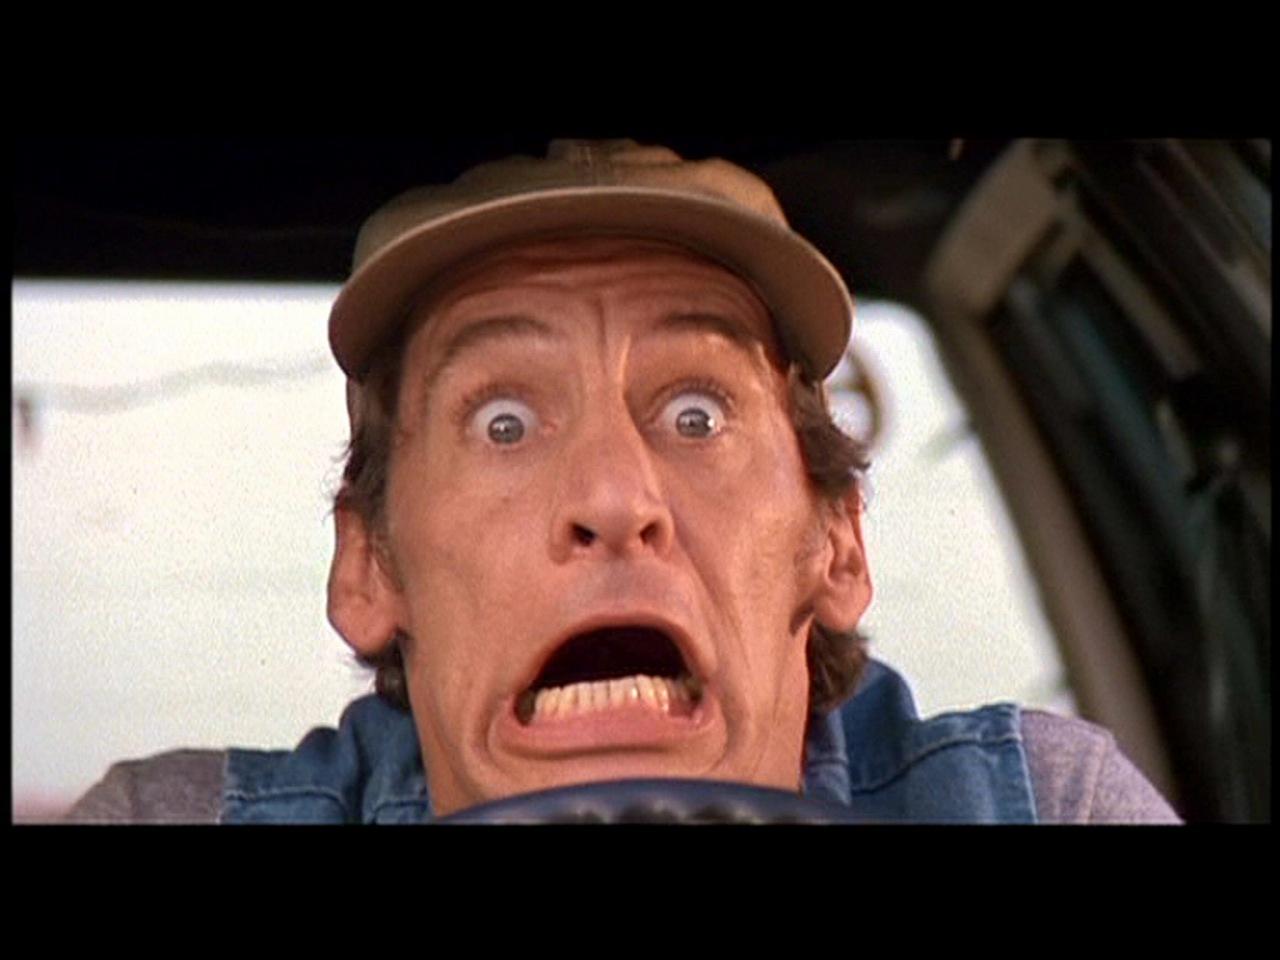 Ernest Saves Christmas Harmony.Shameless Pile Of Stuff Movie Review Ernest Saves Christmas